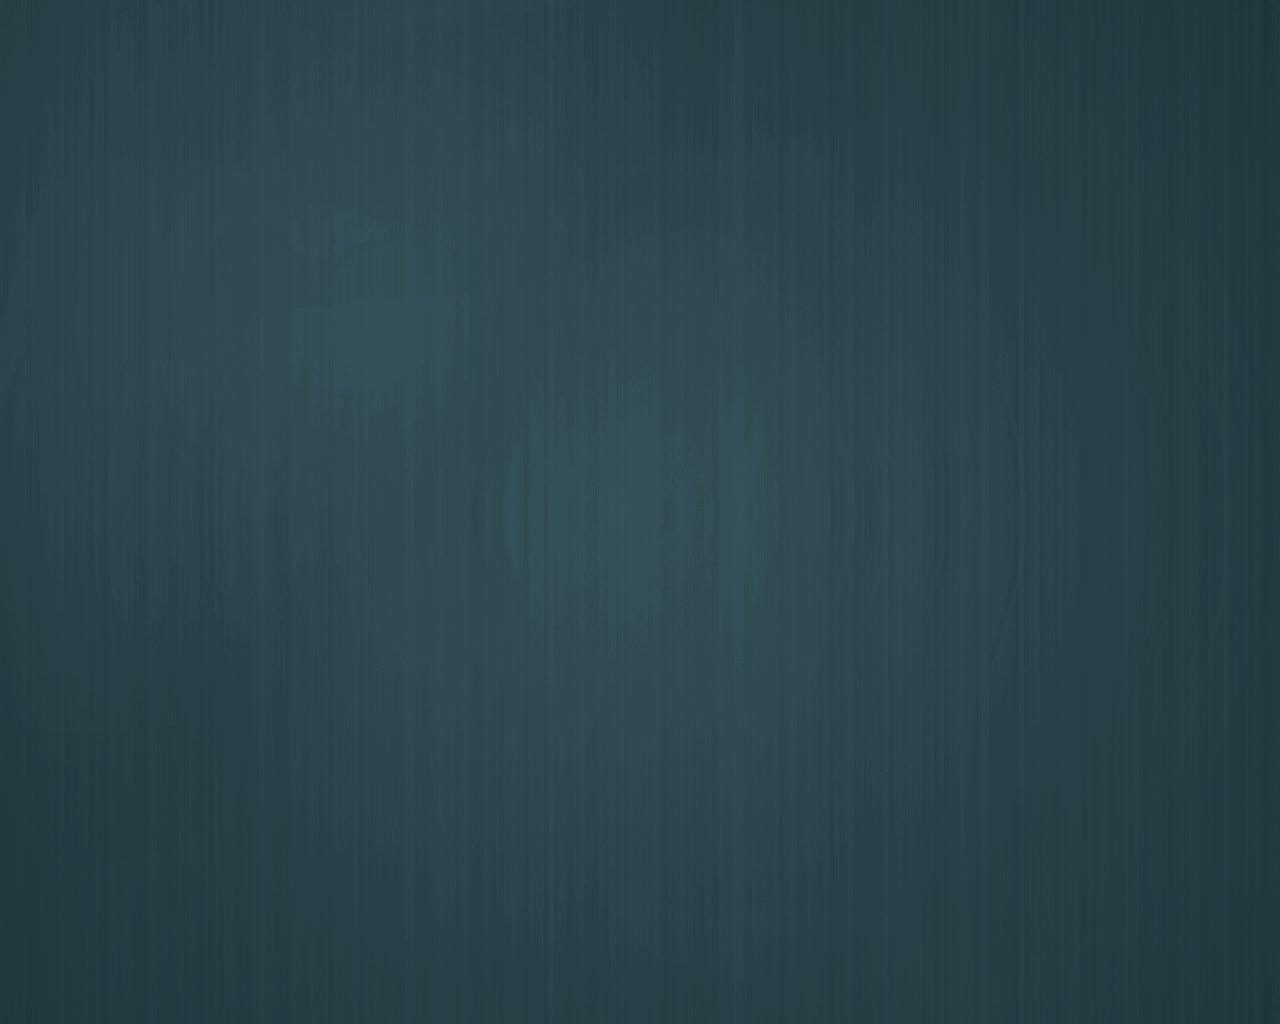 wallpaper stripes blue3 by 10r